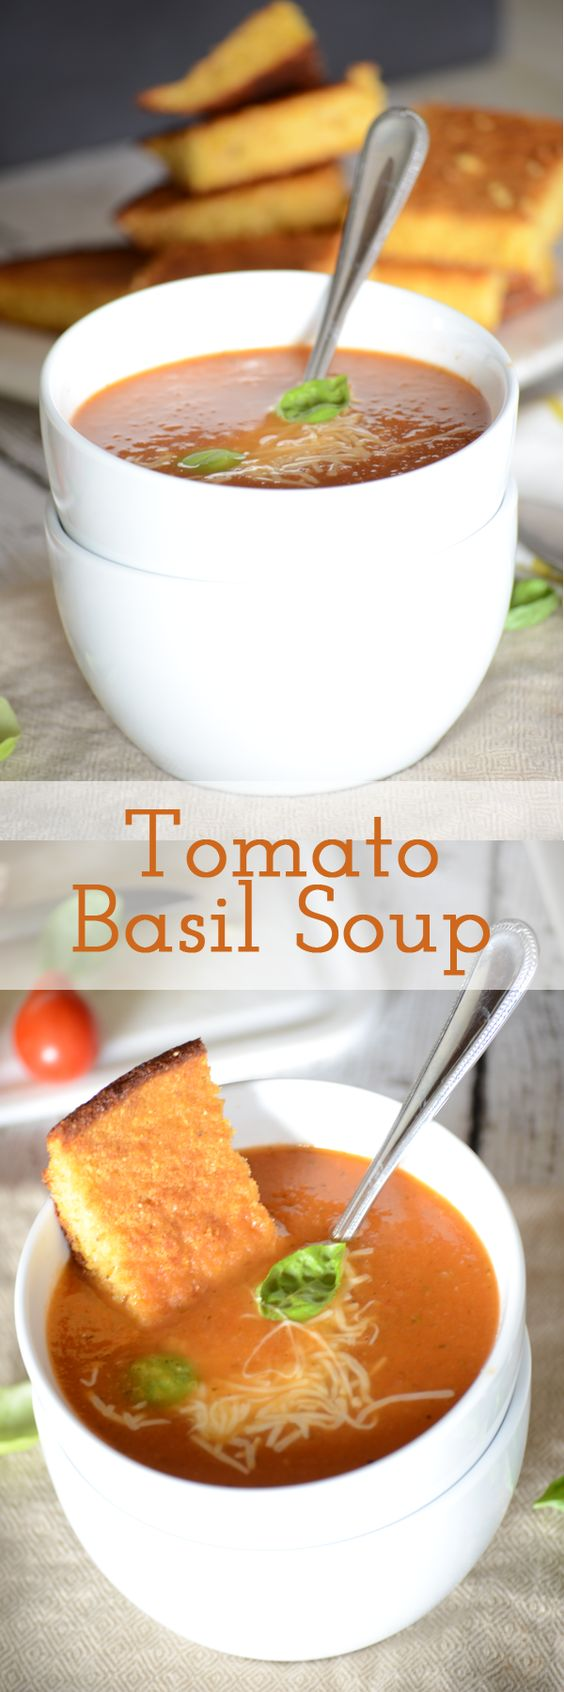 Easy tomato basil soup recipes